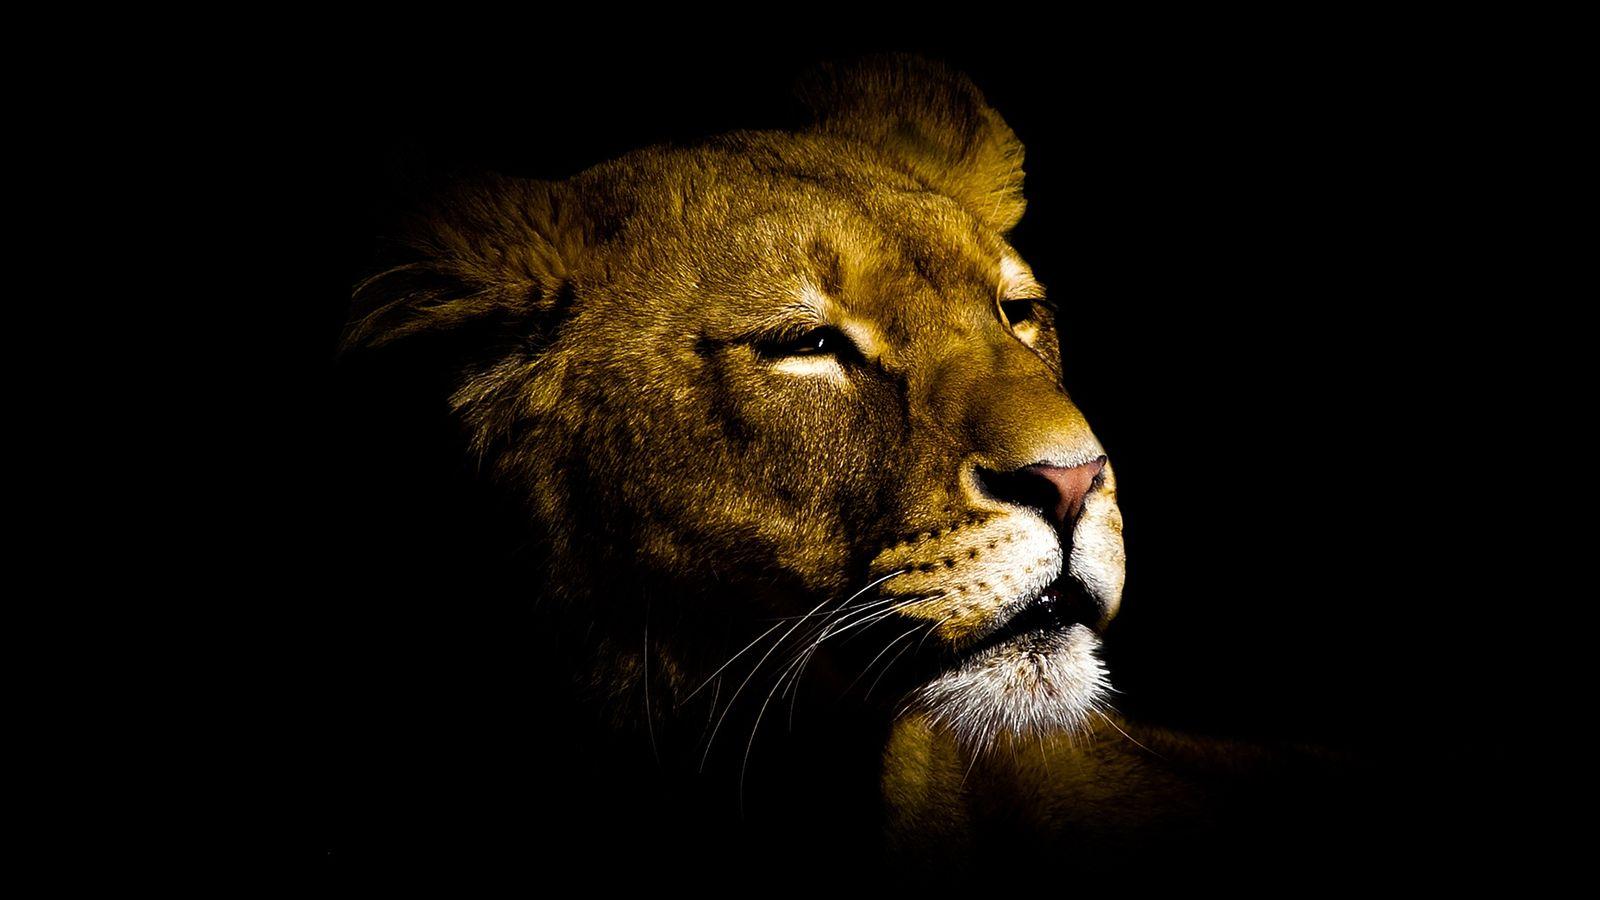 Lion fond ecran hd 10 000 fonds d 39 cran hd gratuits et for Fond ecran animaux hd